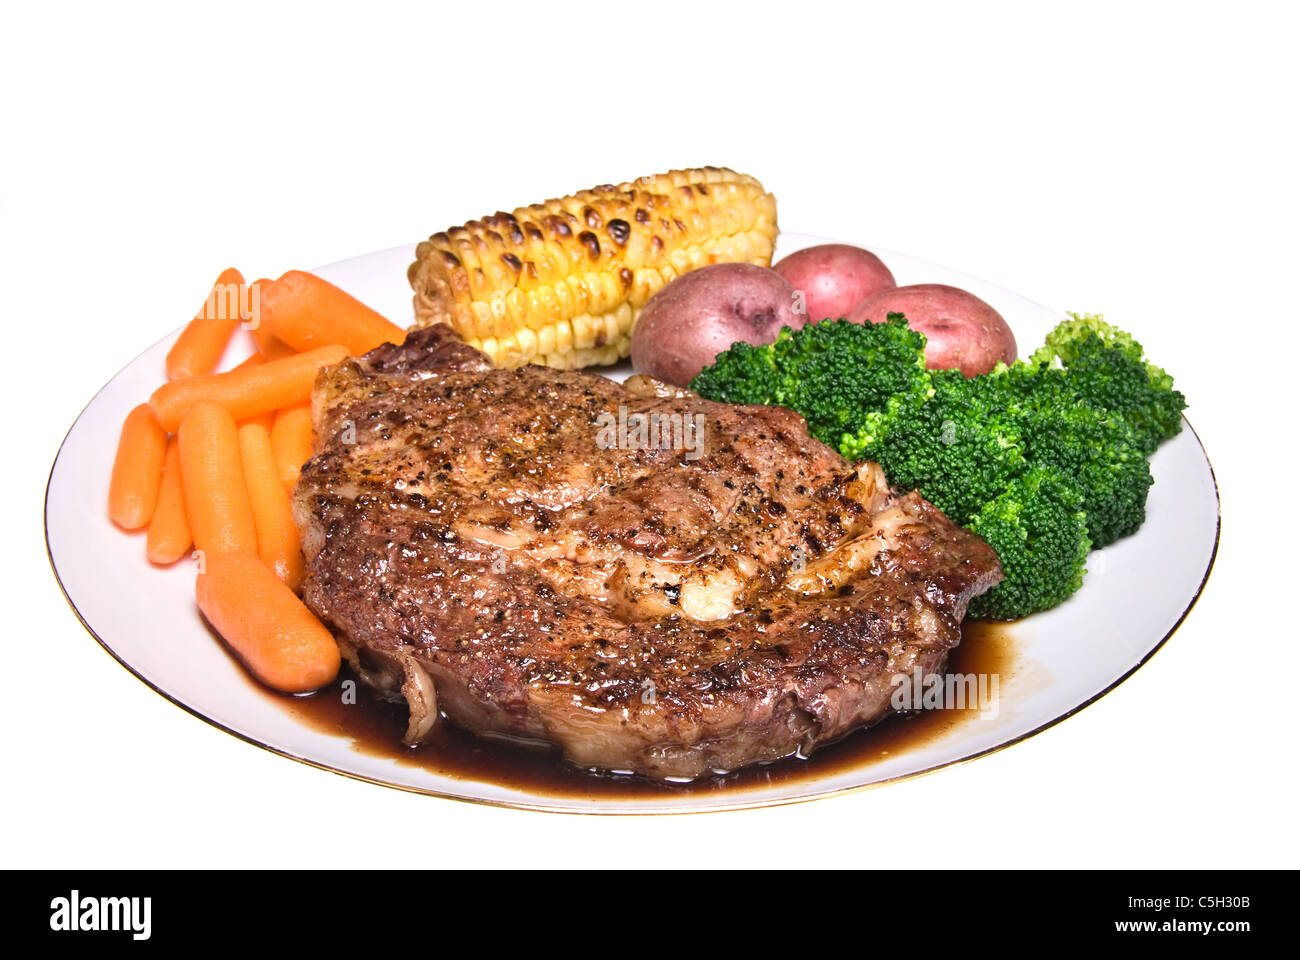 Image Gallery delicious steak